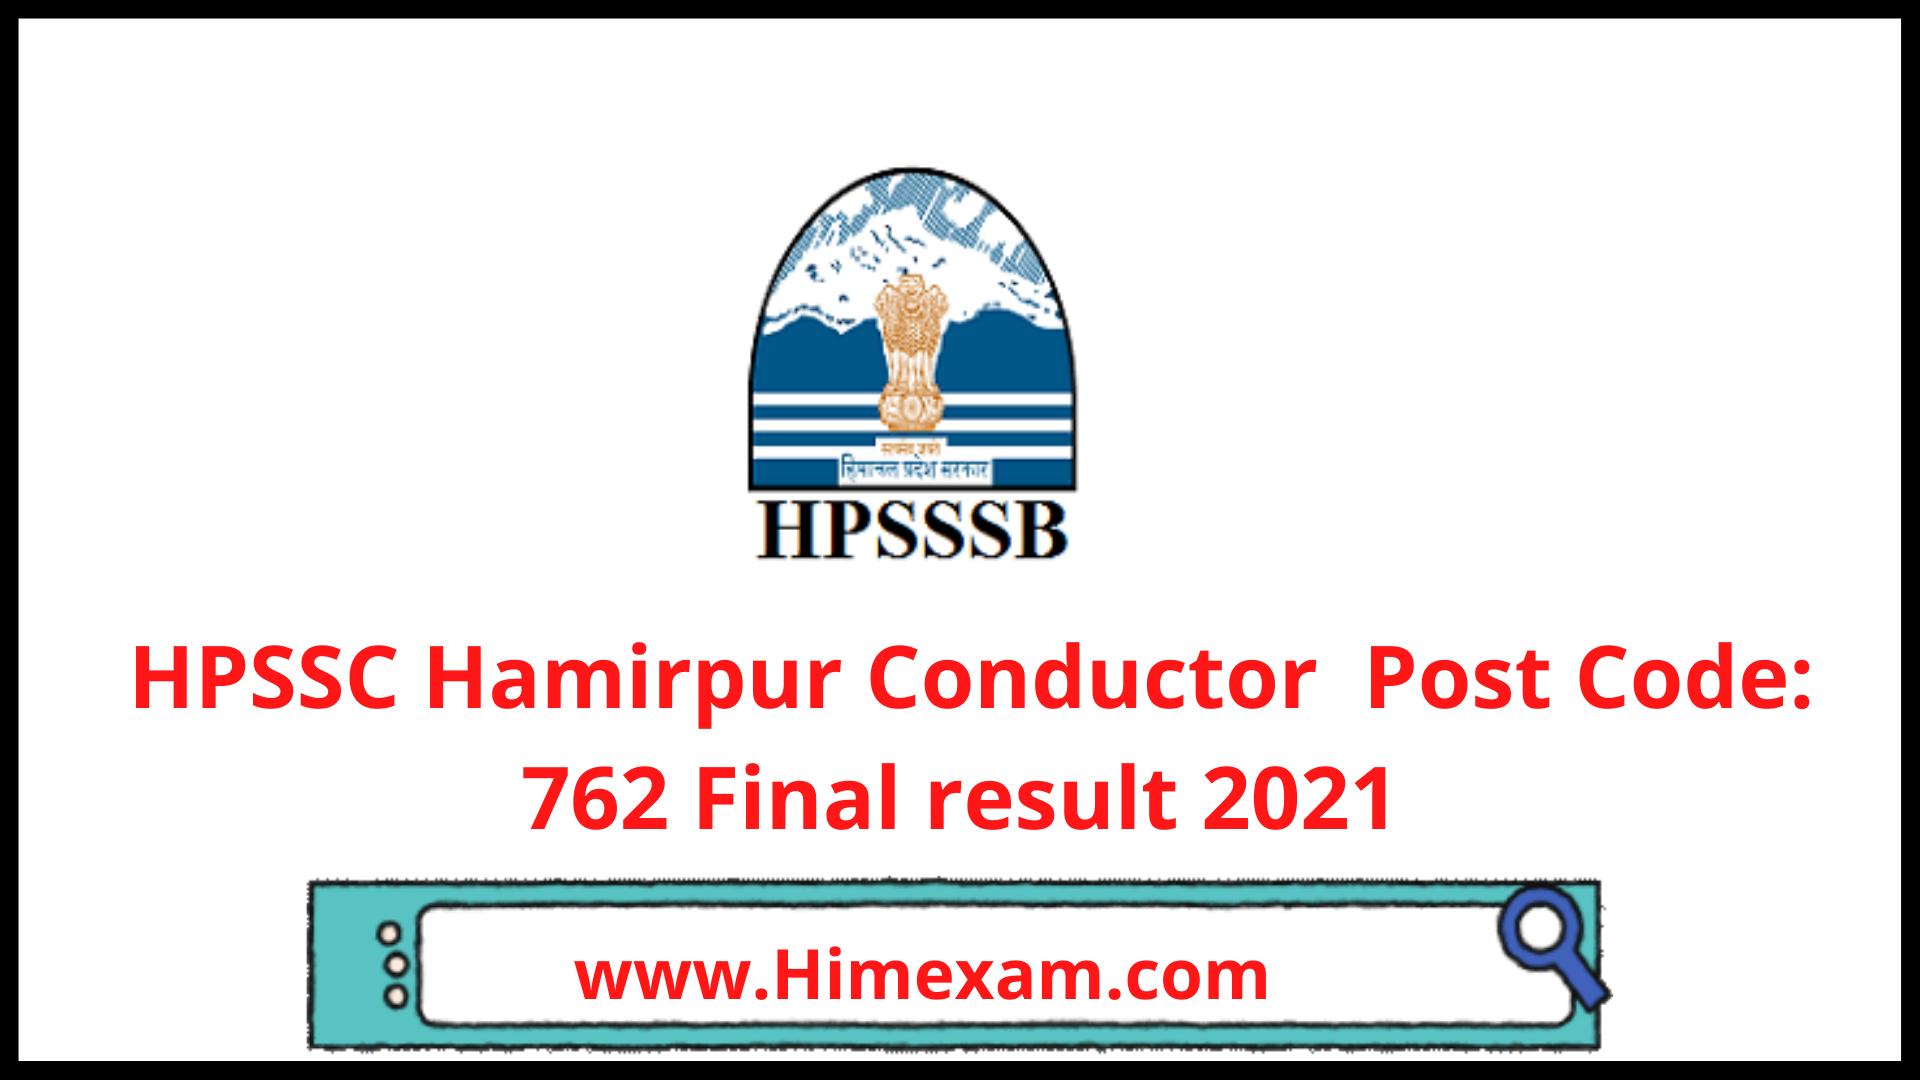 HPSSC Hamirpur Conductor  Post Code: 762 Exam Final result 2021